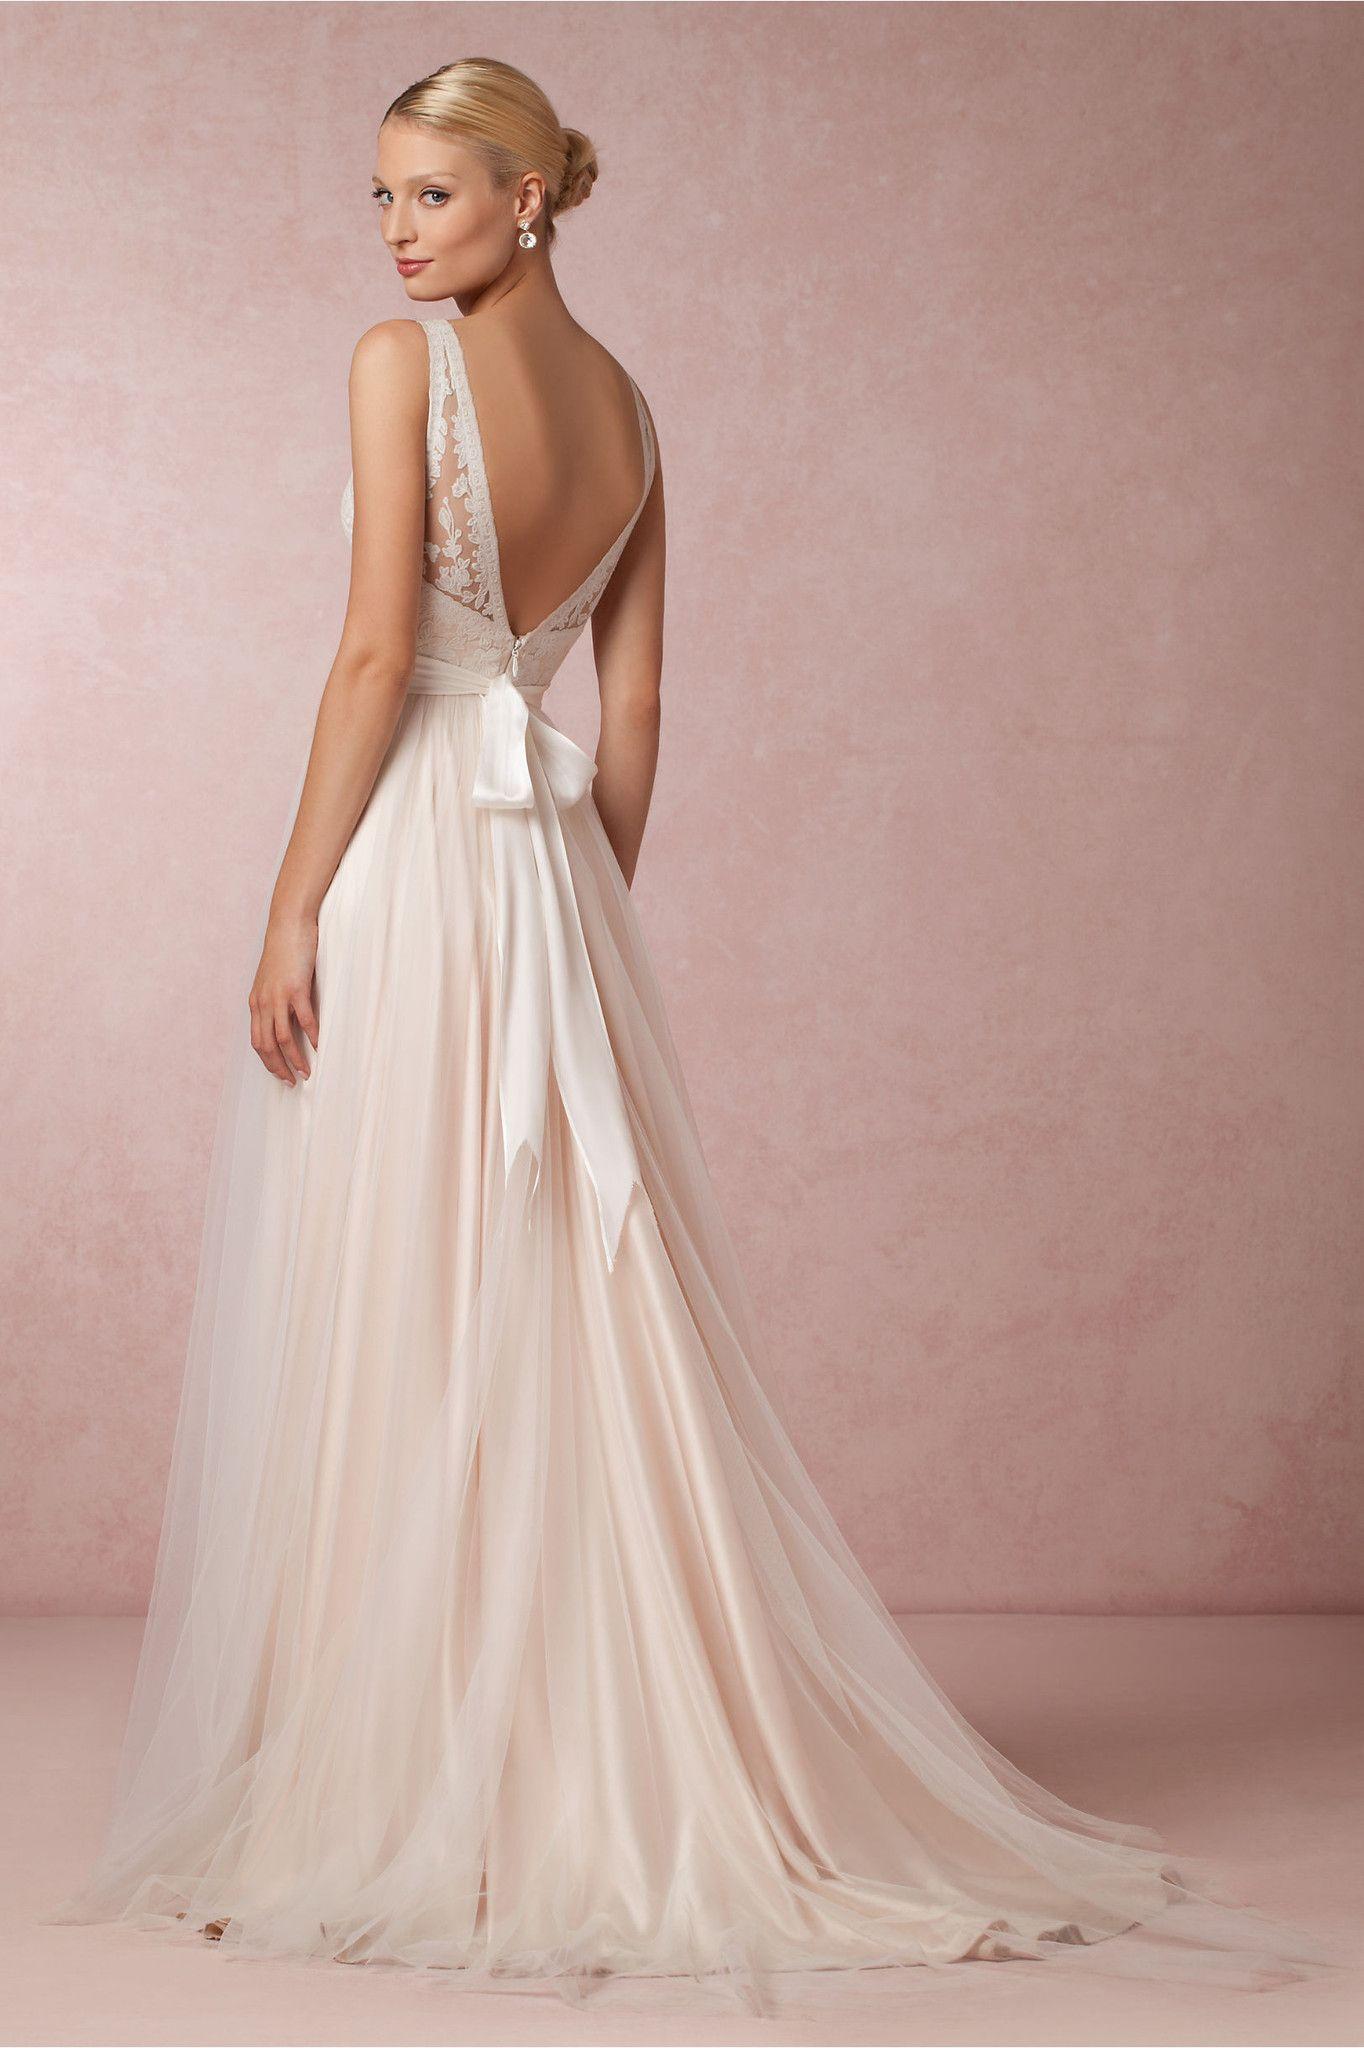 BHLDN \'Tamsin\' | Big photo, Wedding dress and Weddings